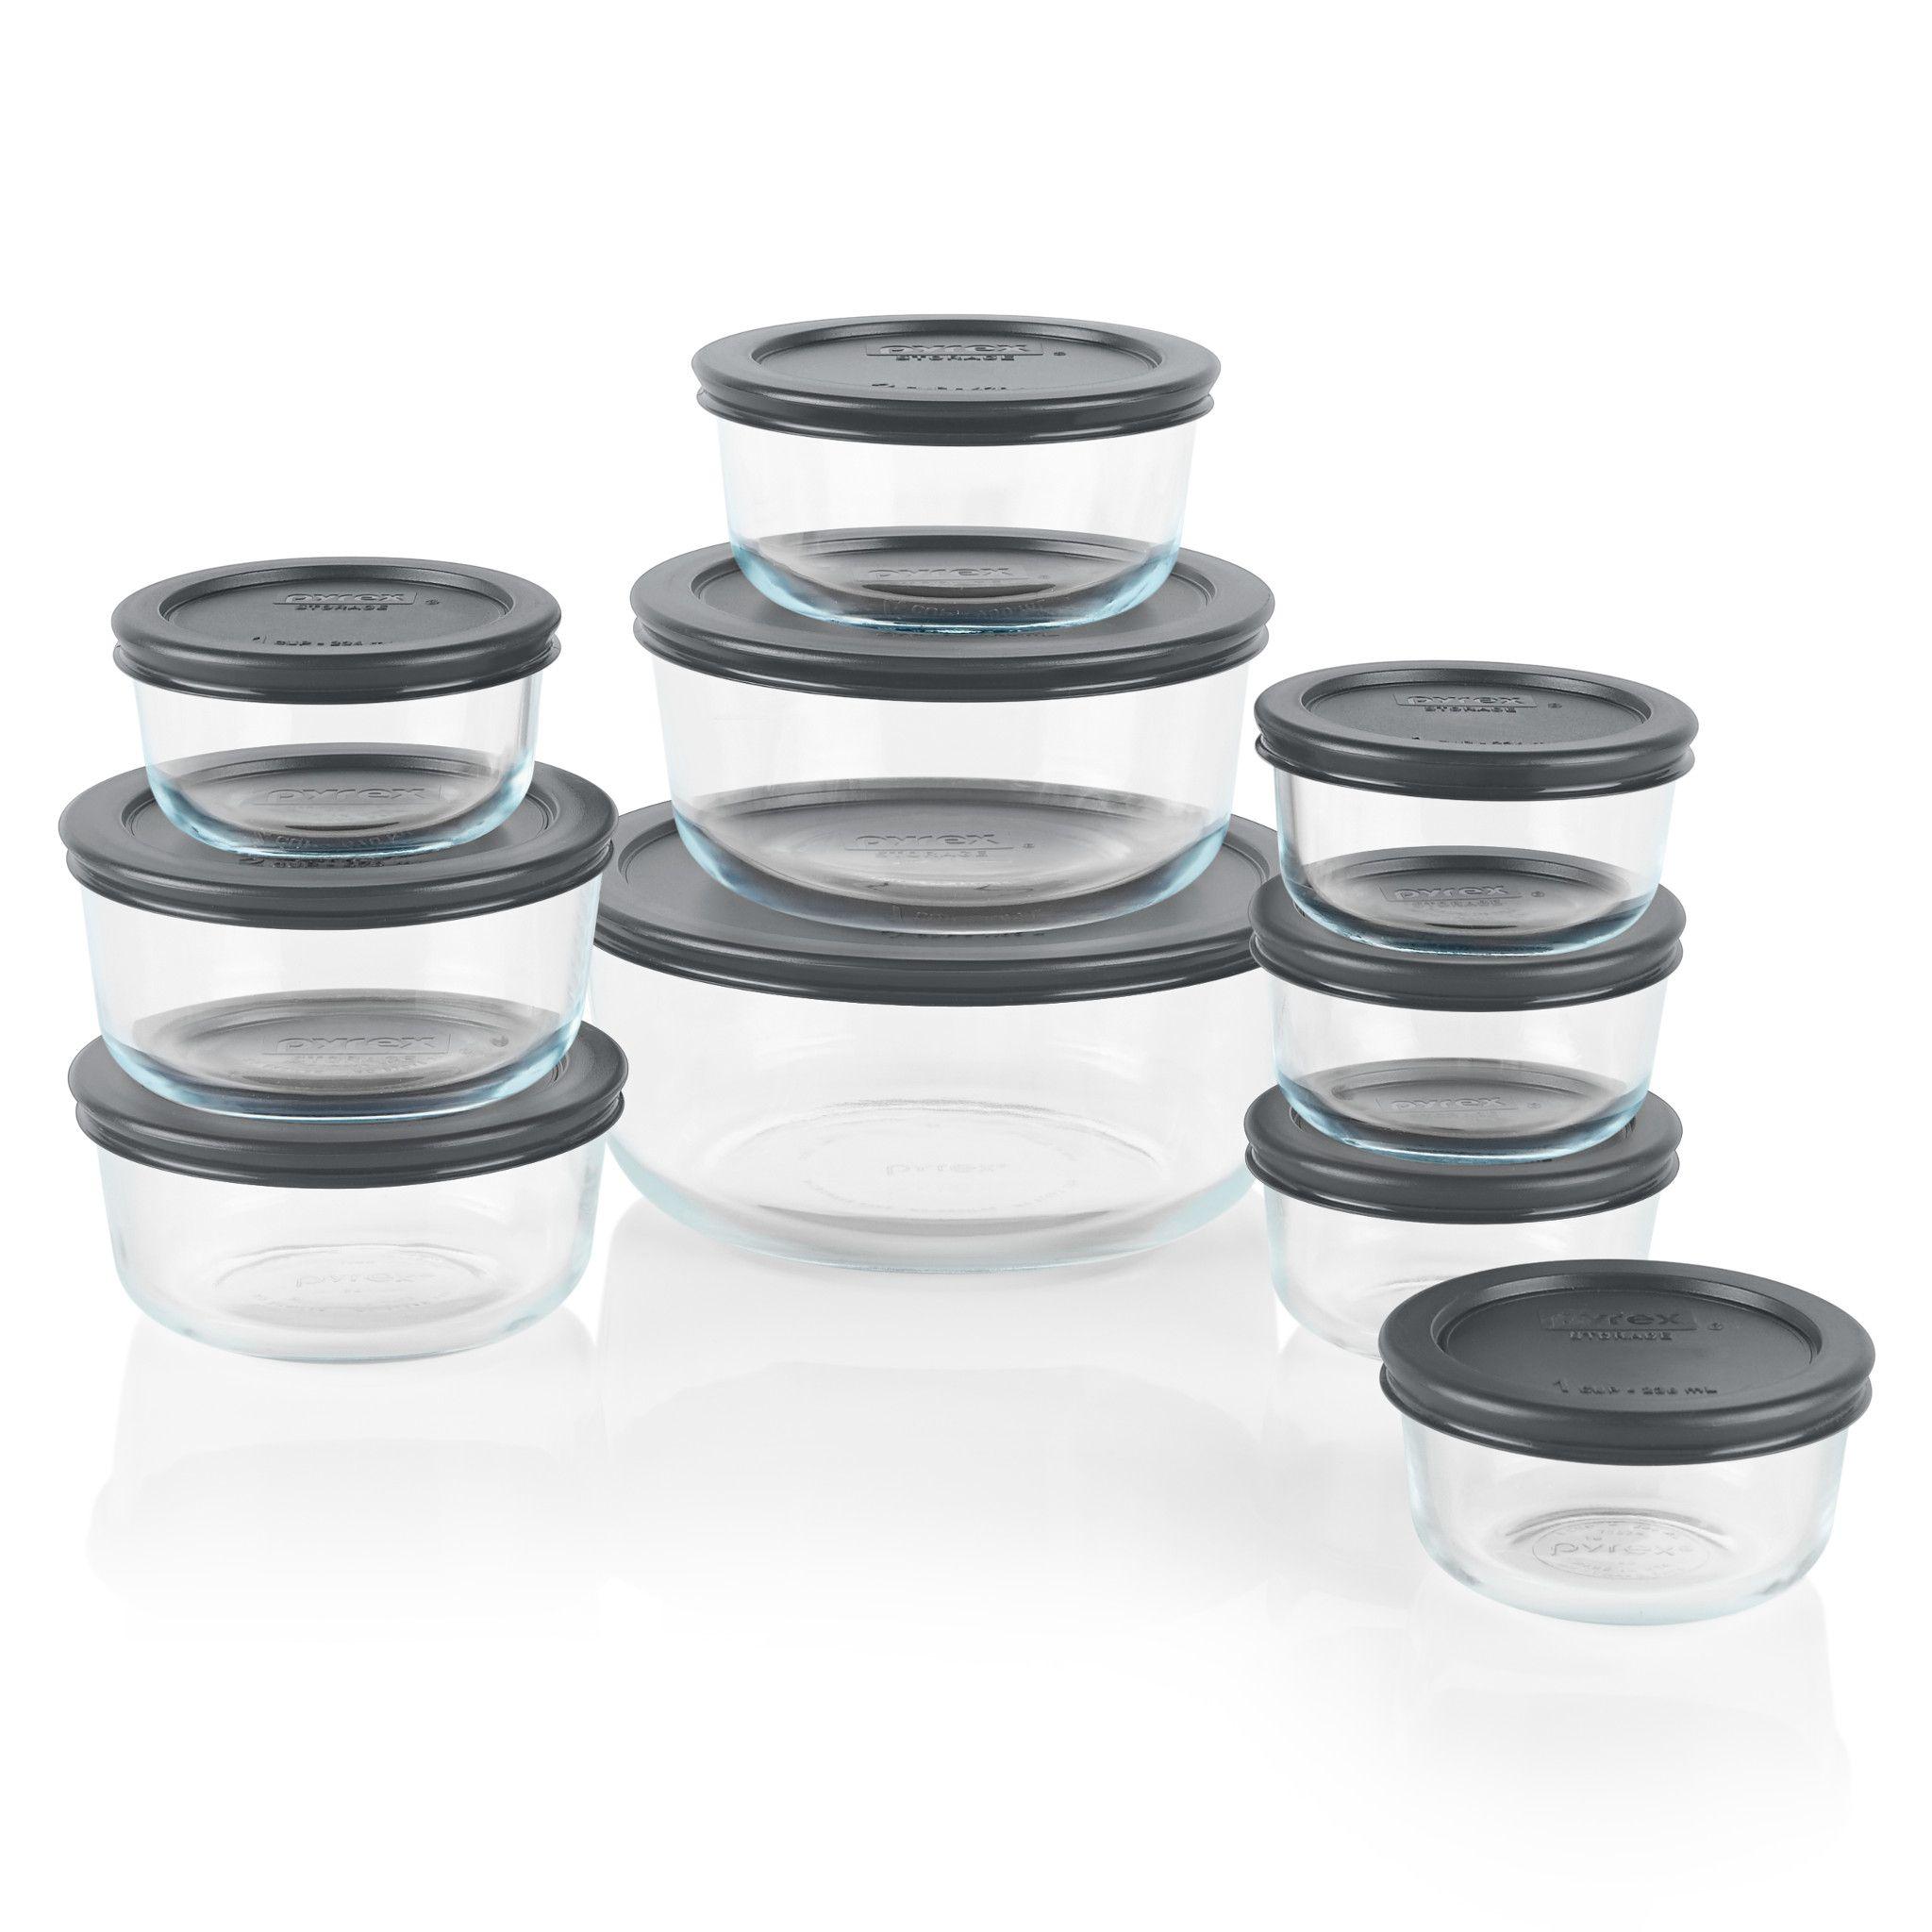 Simply Store 174 20 Pc Set W Gray Lids Corningware